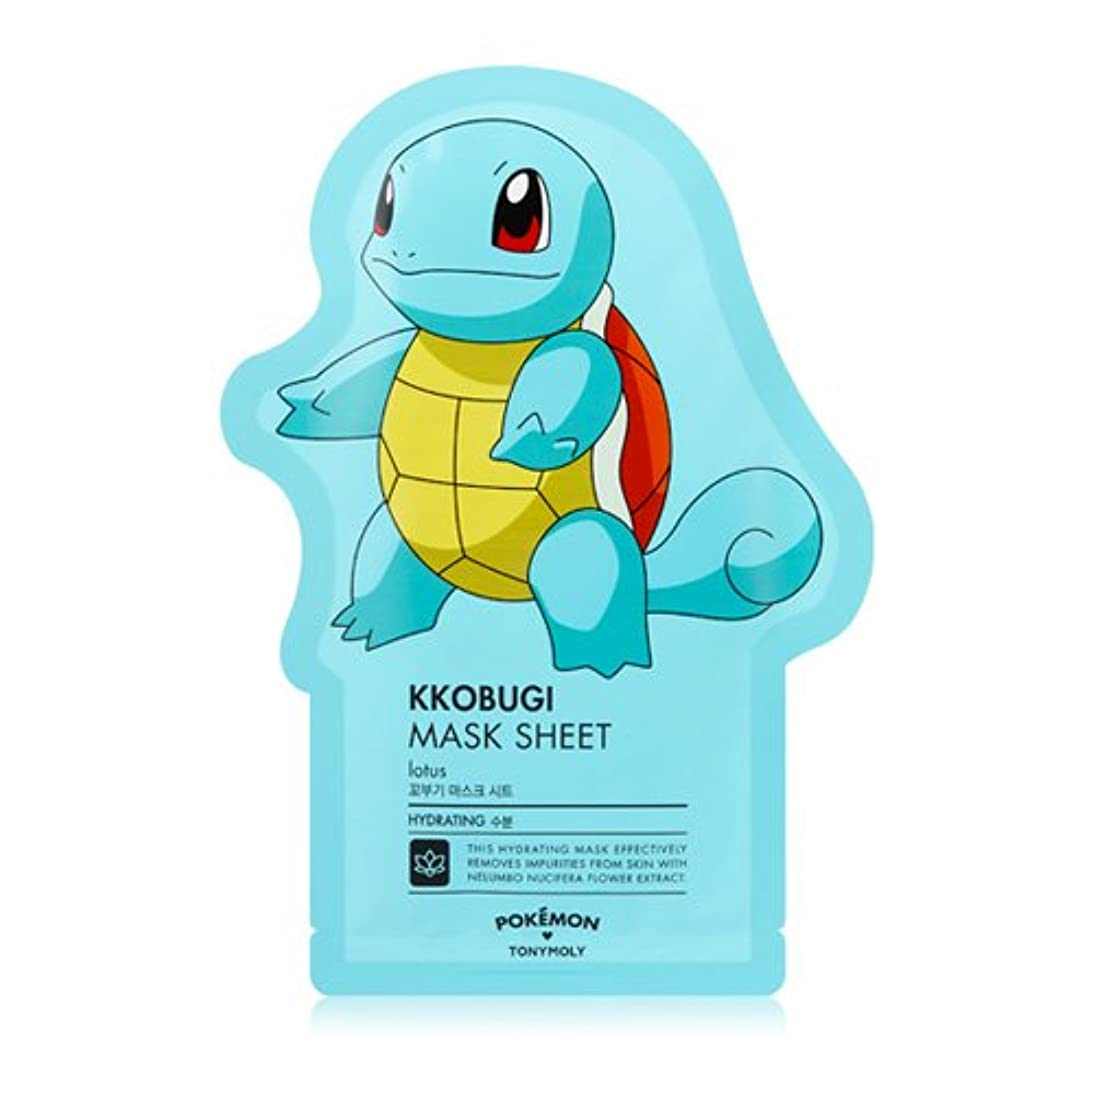 TONYMOLY x Pokemon Squirtle/Kkobugi Mask Sheet (並行輸入品)